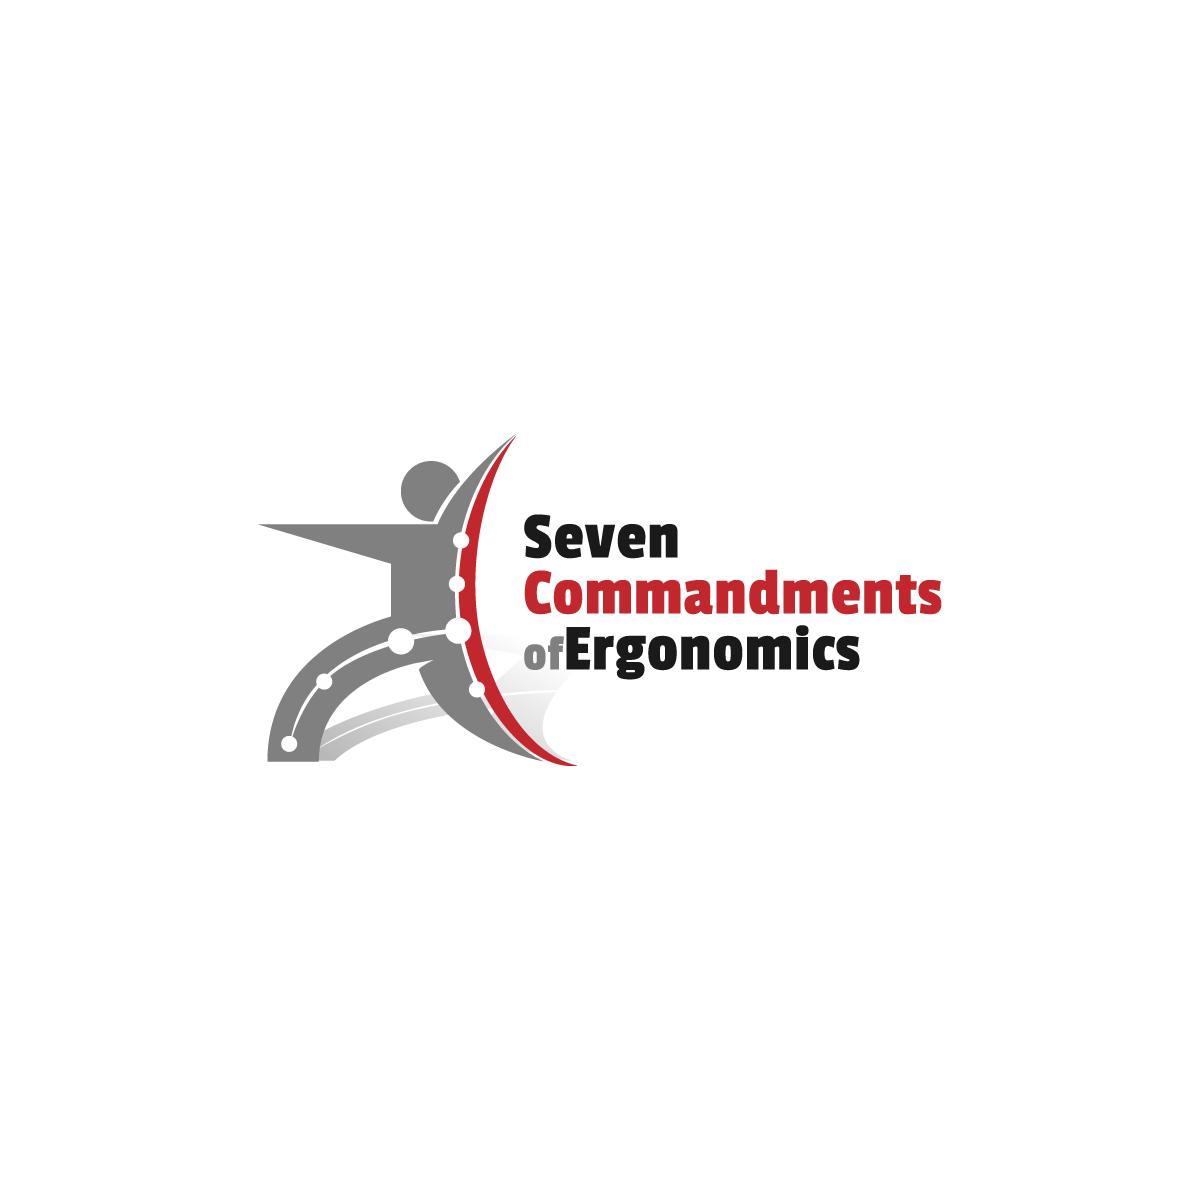 Logo Design by zesthar - Entry No. 38 in the Logo Design Contest Logo Design for Seven Commandments of Ergonomics.